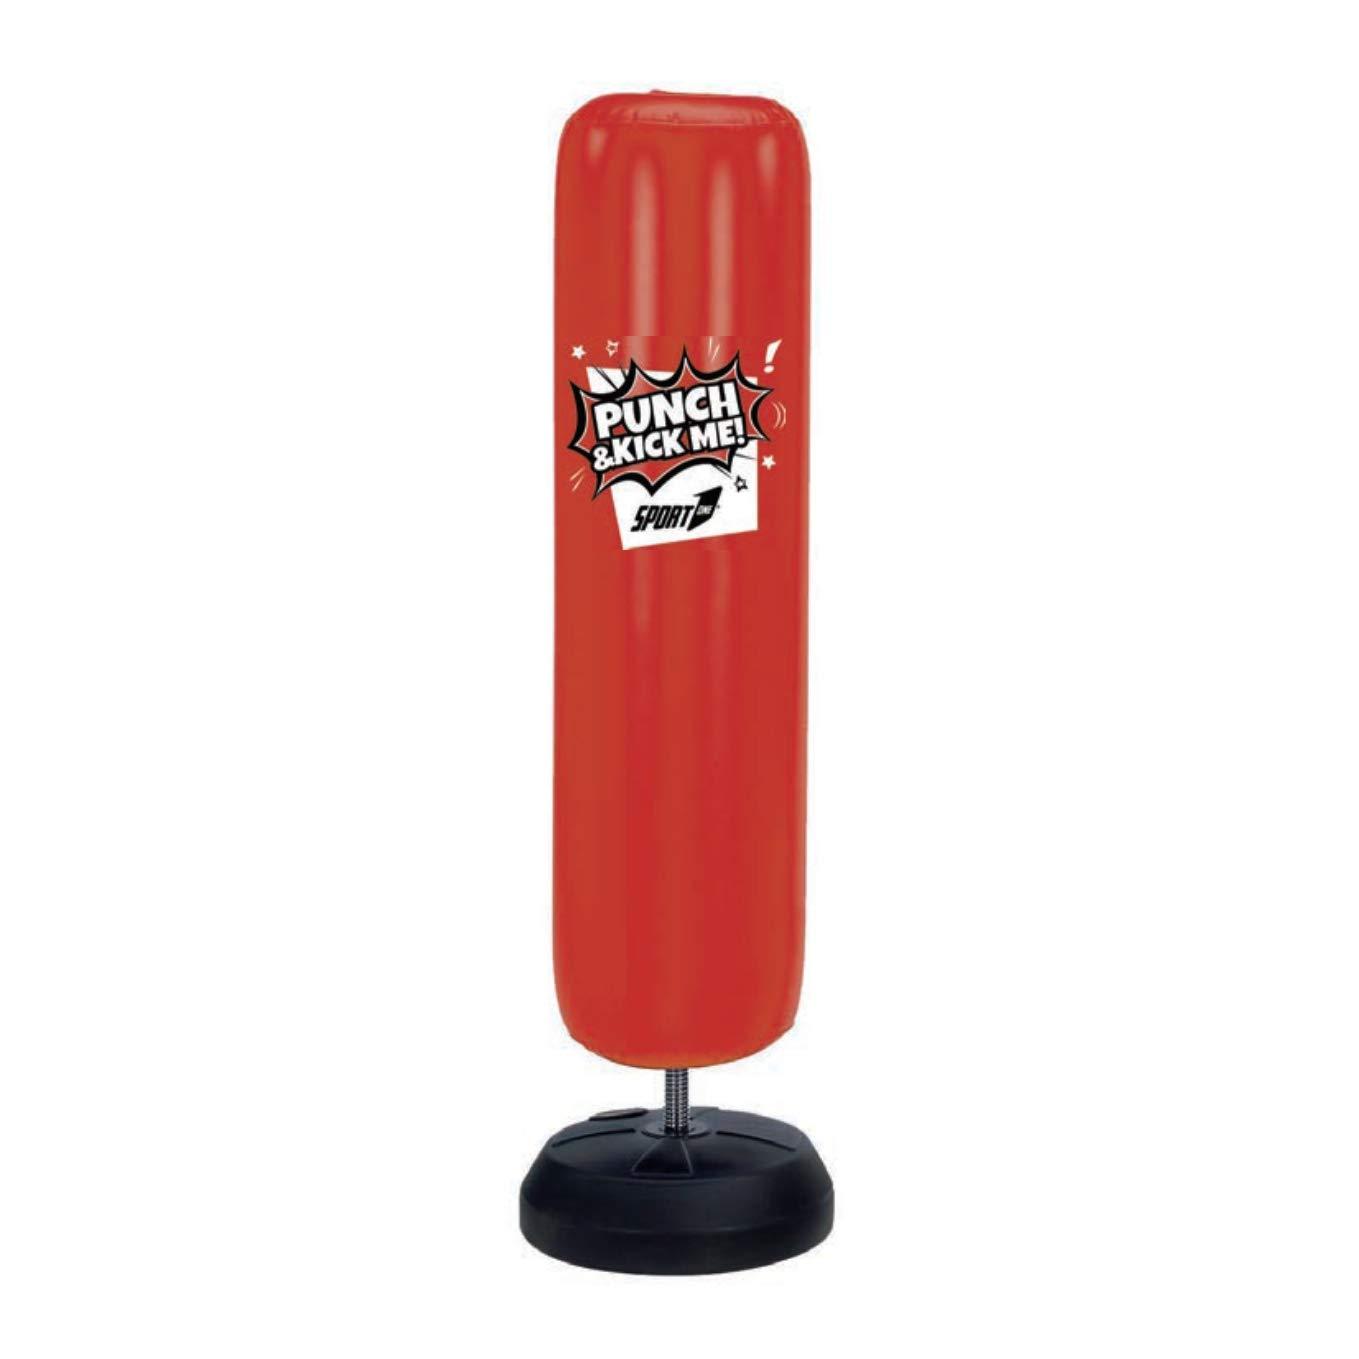 Deporte One 82 - 632 G, Punch Bag Hinchable Juventud Unisex, Rojo ...